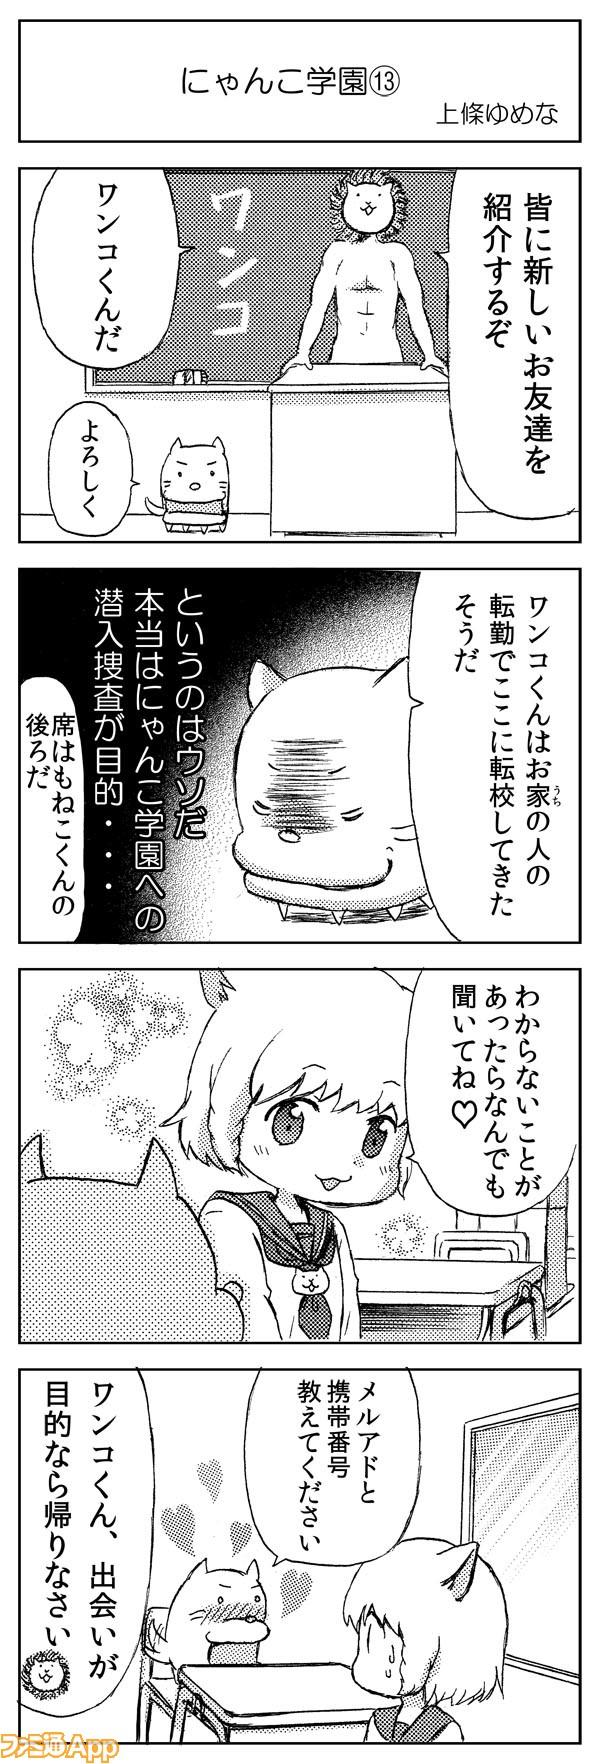 03kami_073